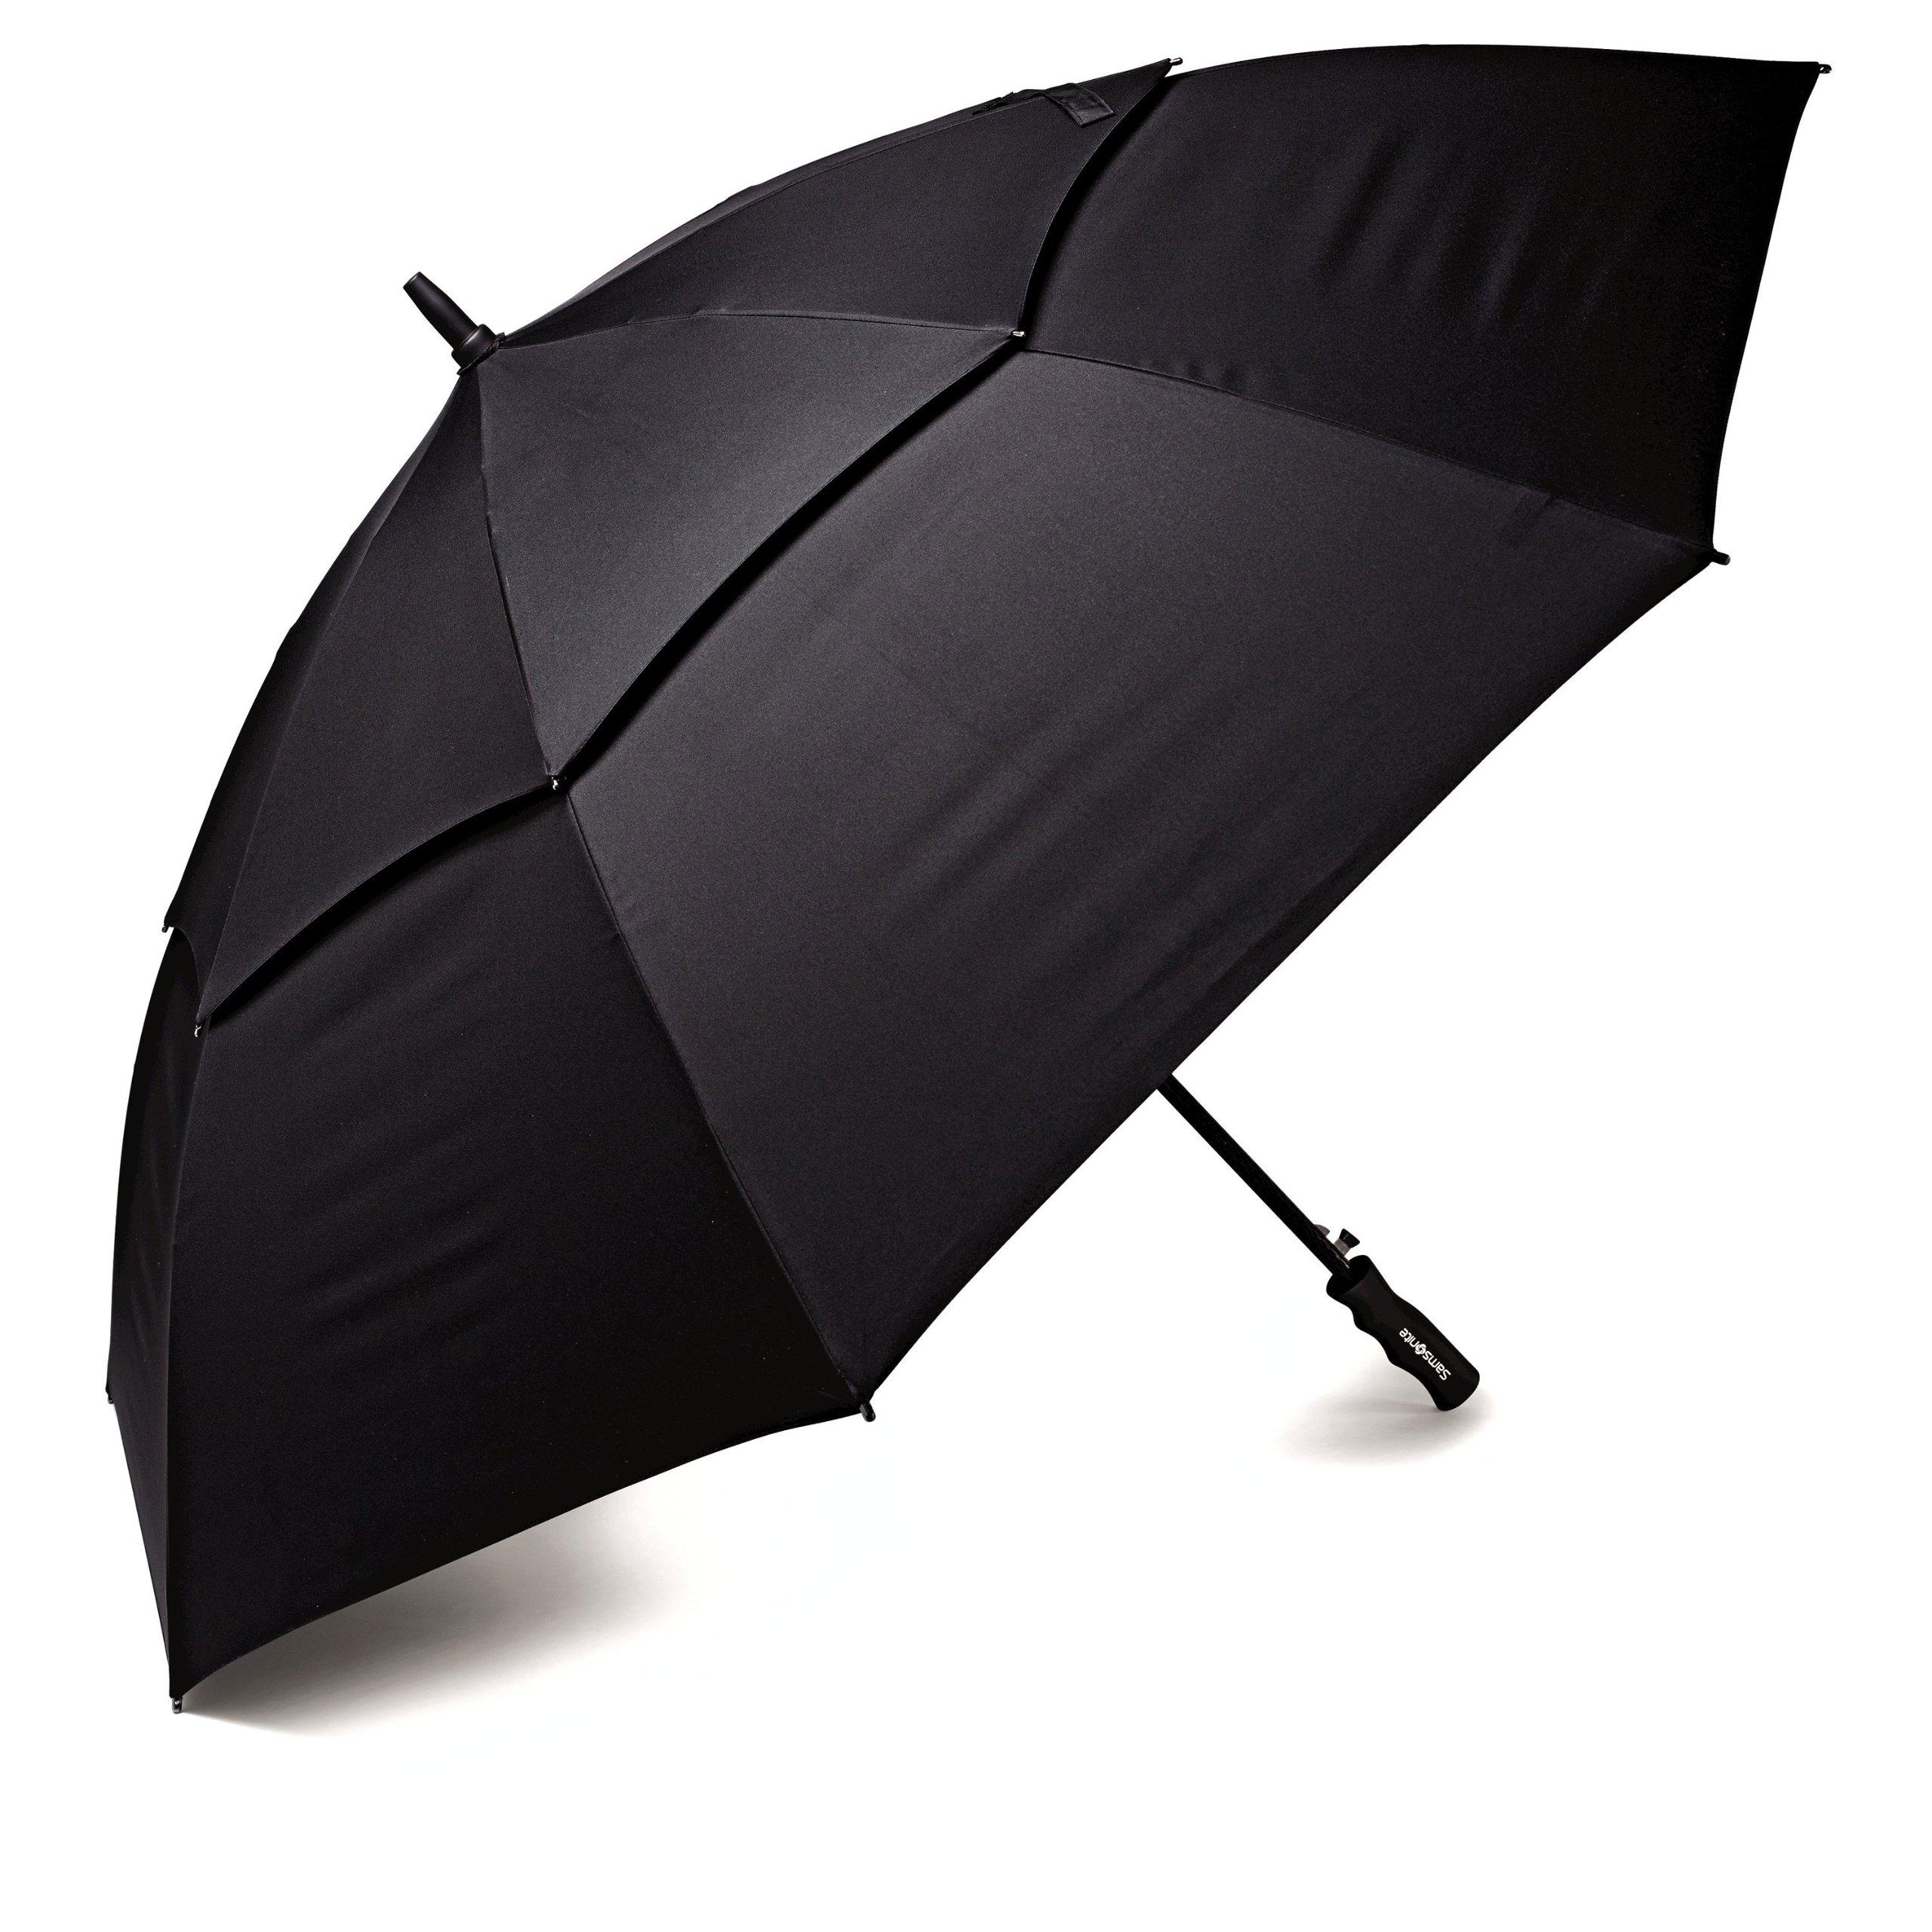 Samsonite Windguard Golf Umbrella, Black by Samsonite